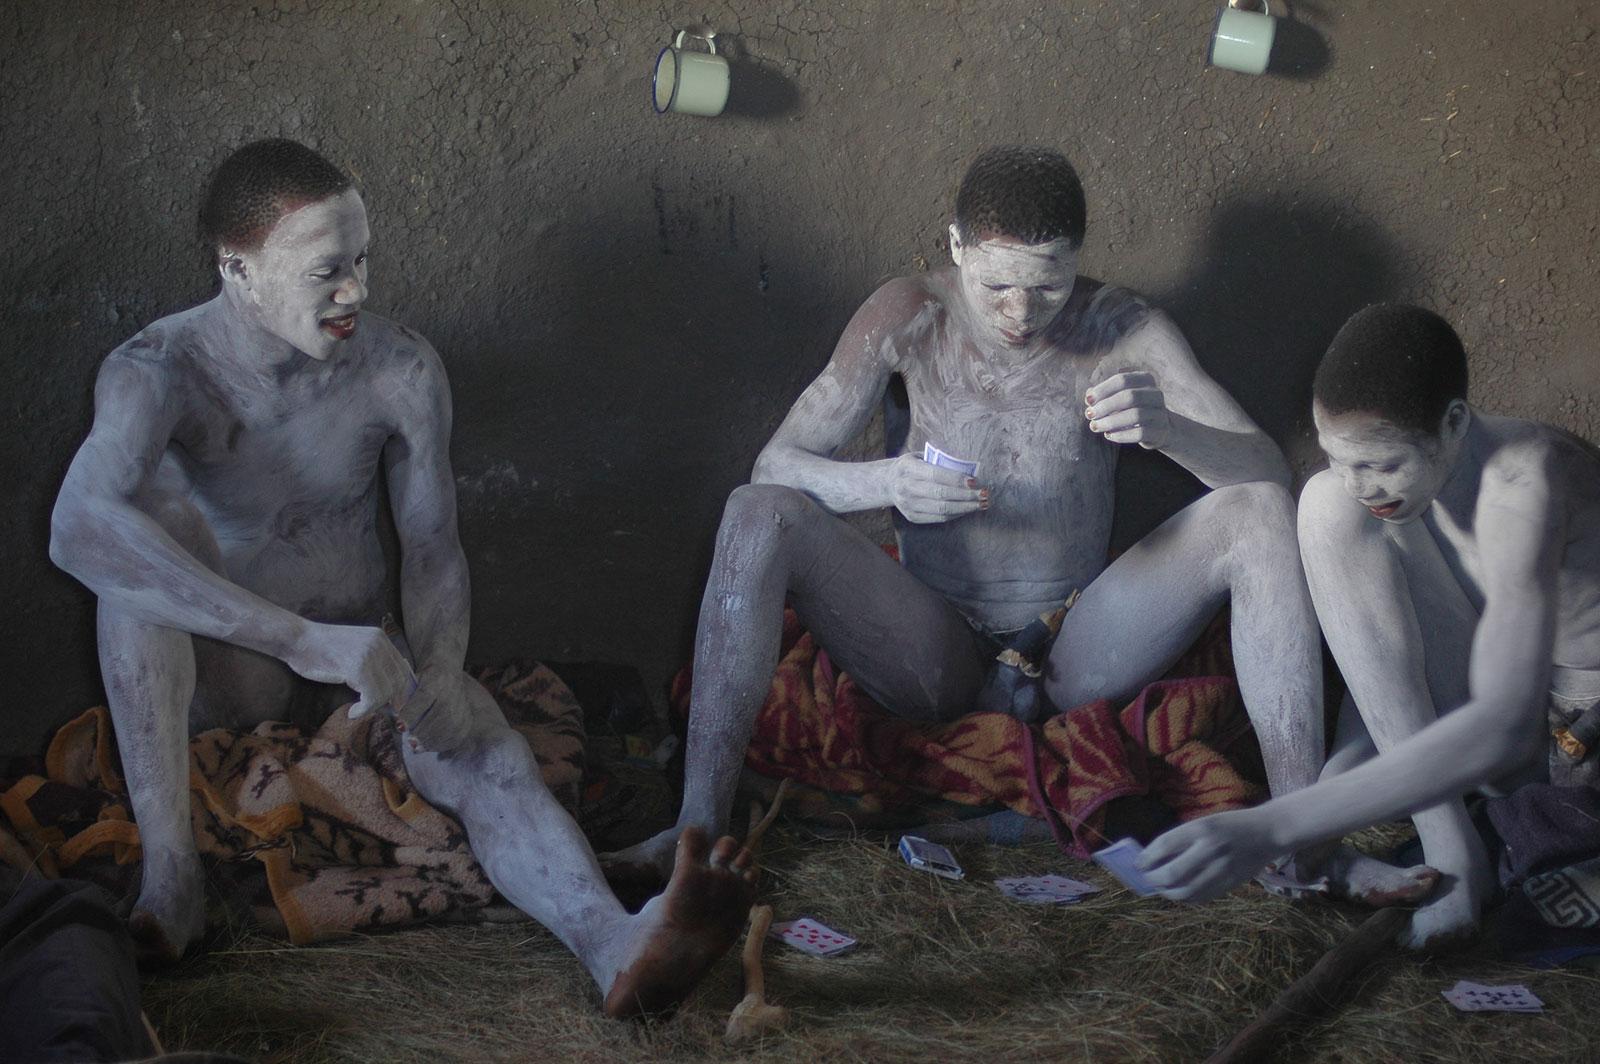 Stammencultuur in Zuid-Afrika. Mannen spelen kaartspel.